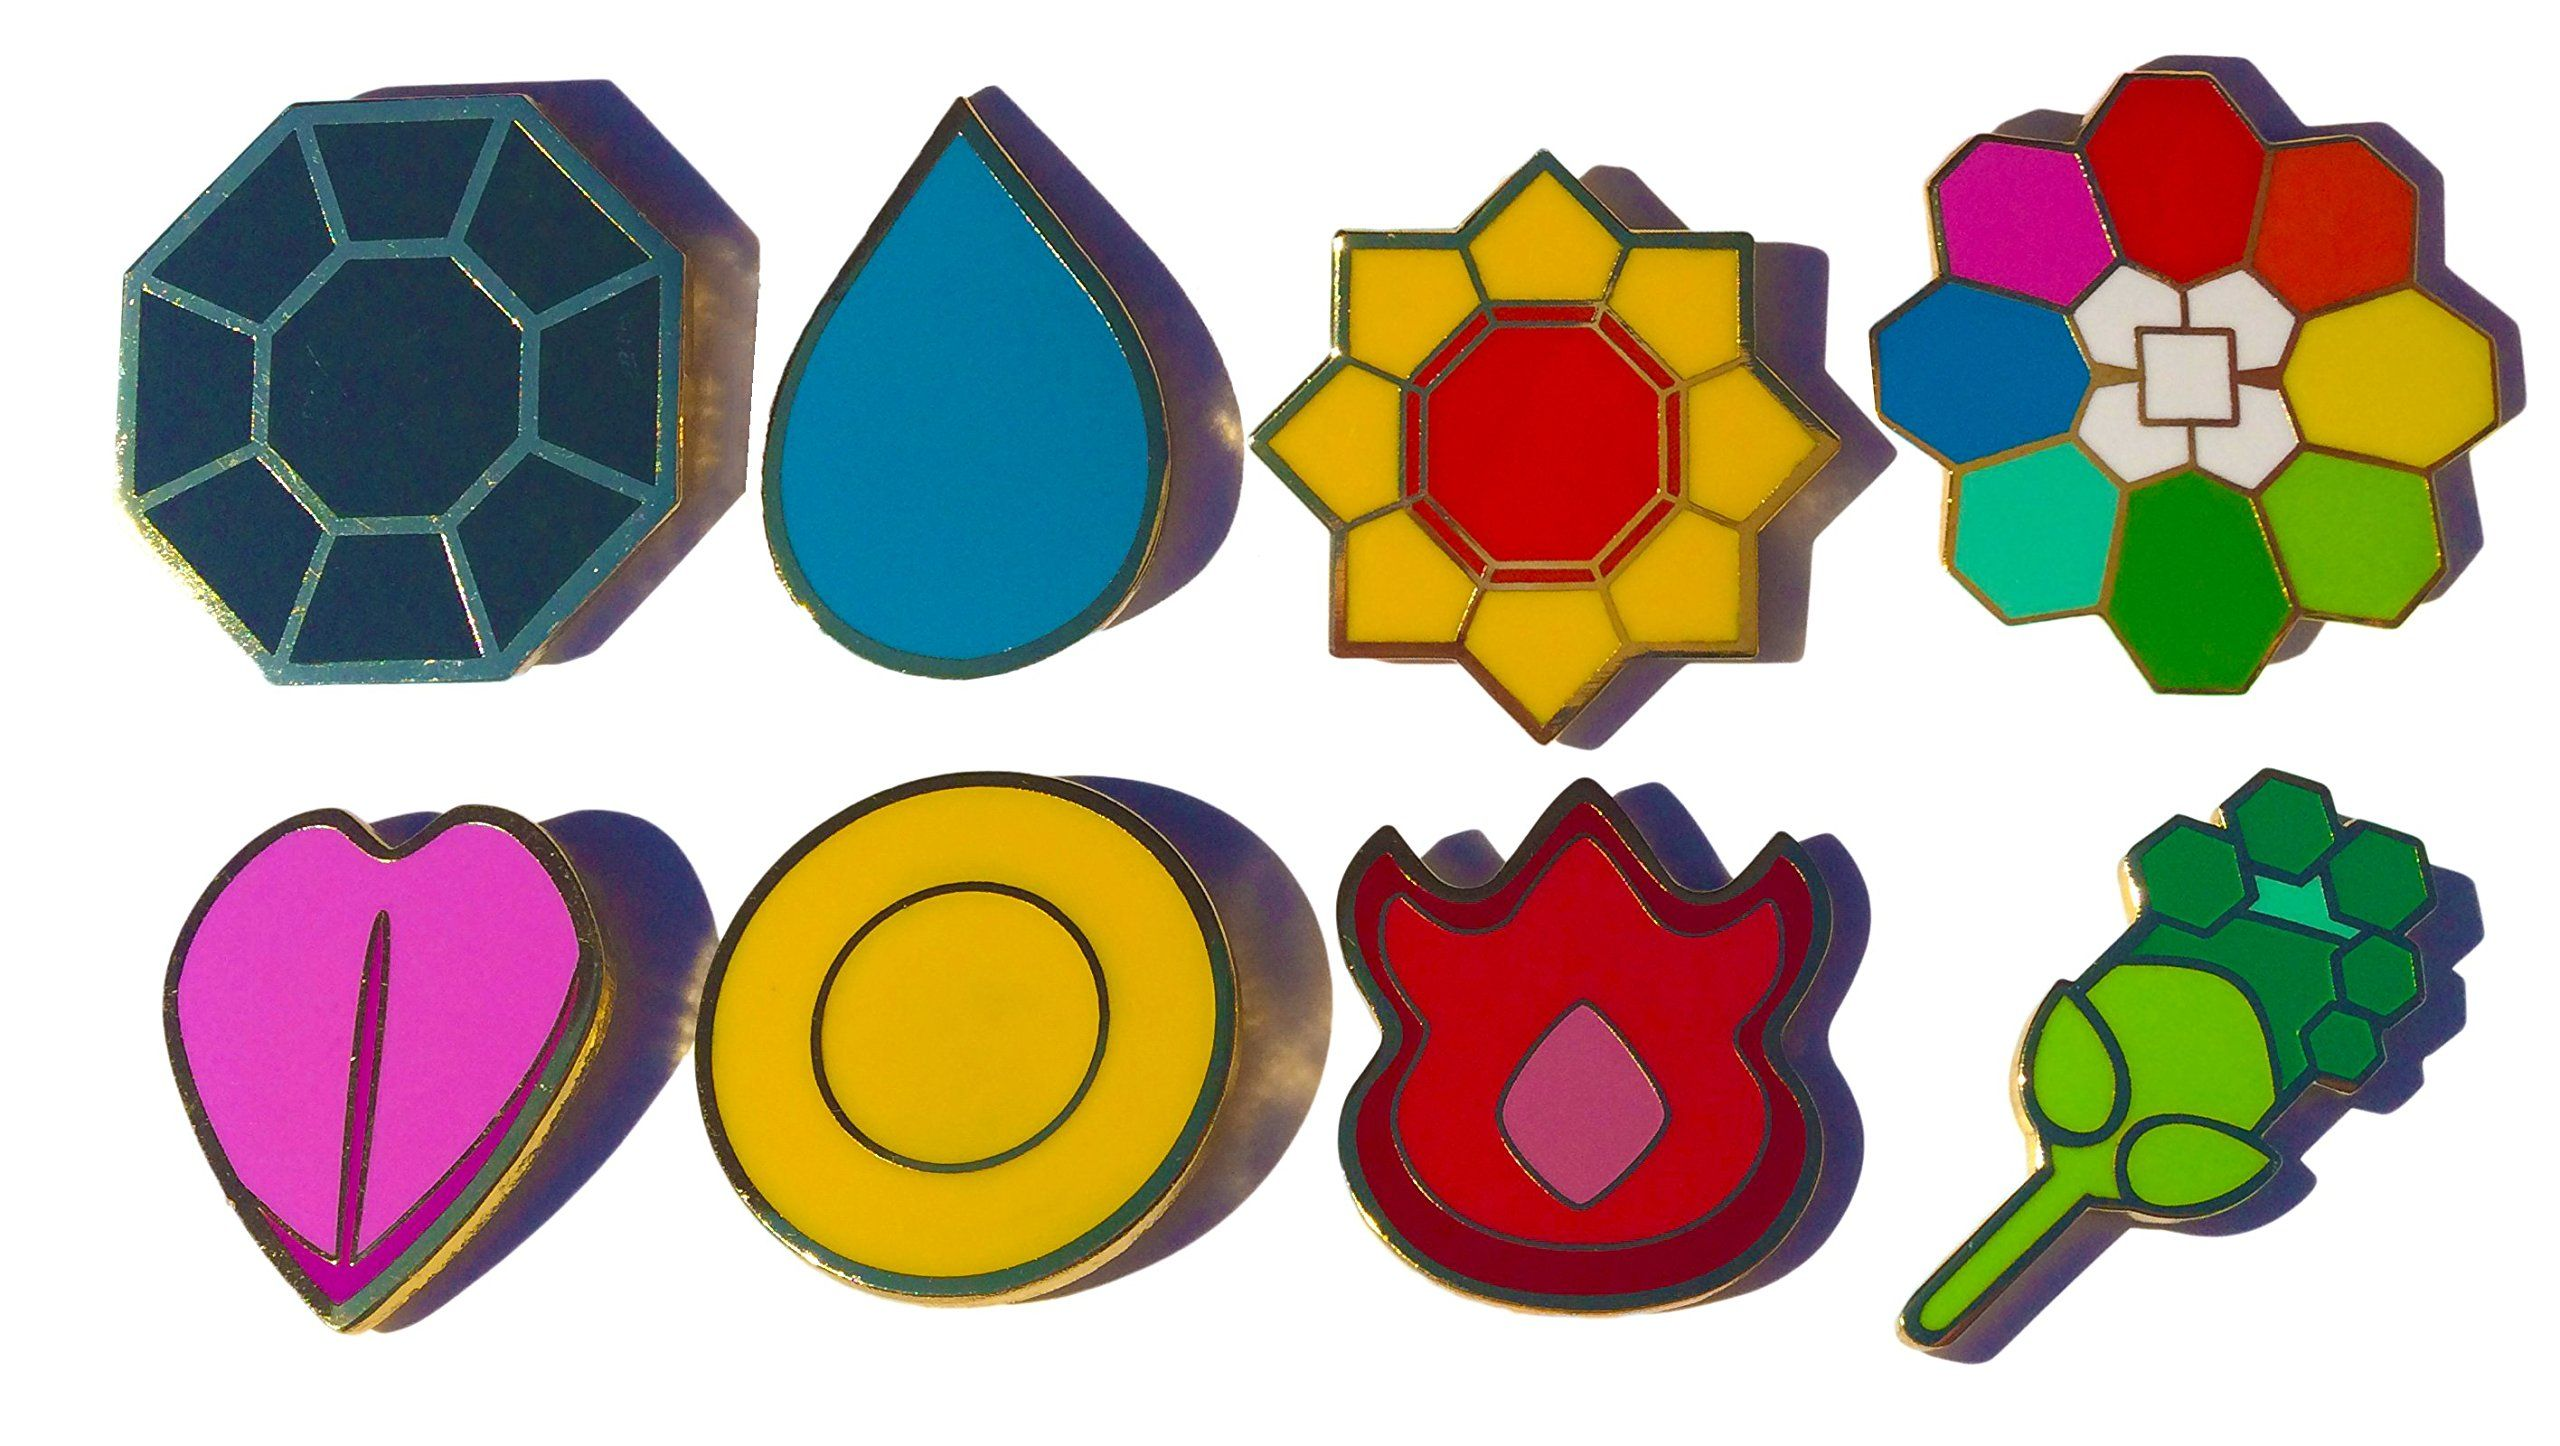 Gen 1 pokemon badges